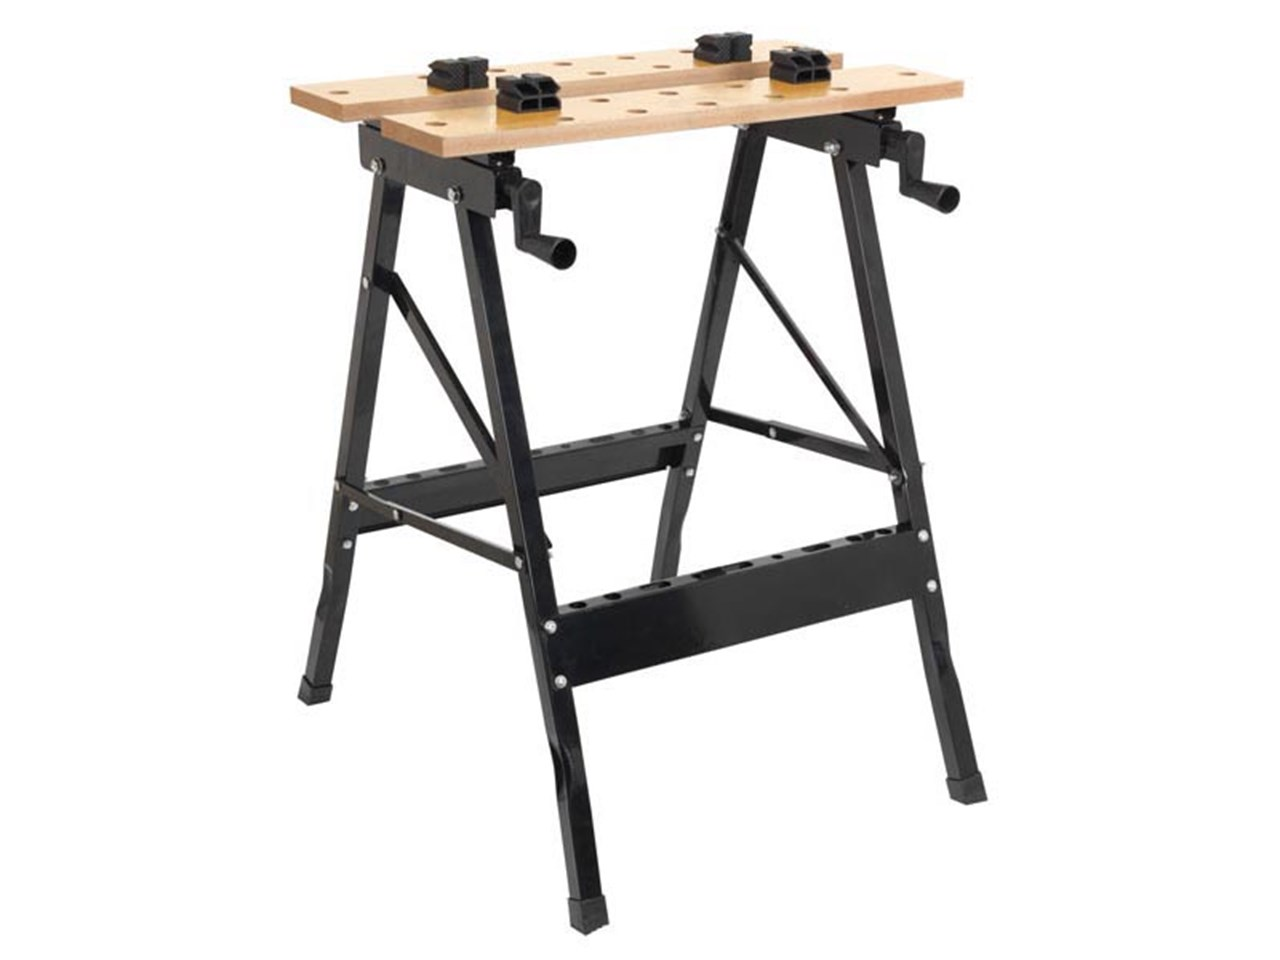 Prime Sealey Fwb1 Folding Workbench 290Mm Capacity Camellatalisay Diy Chair Ideas Camellatalisaycom